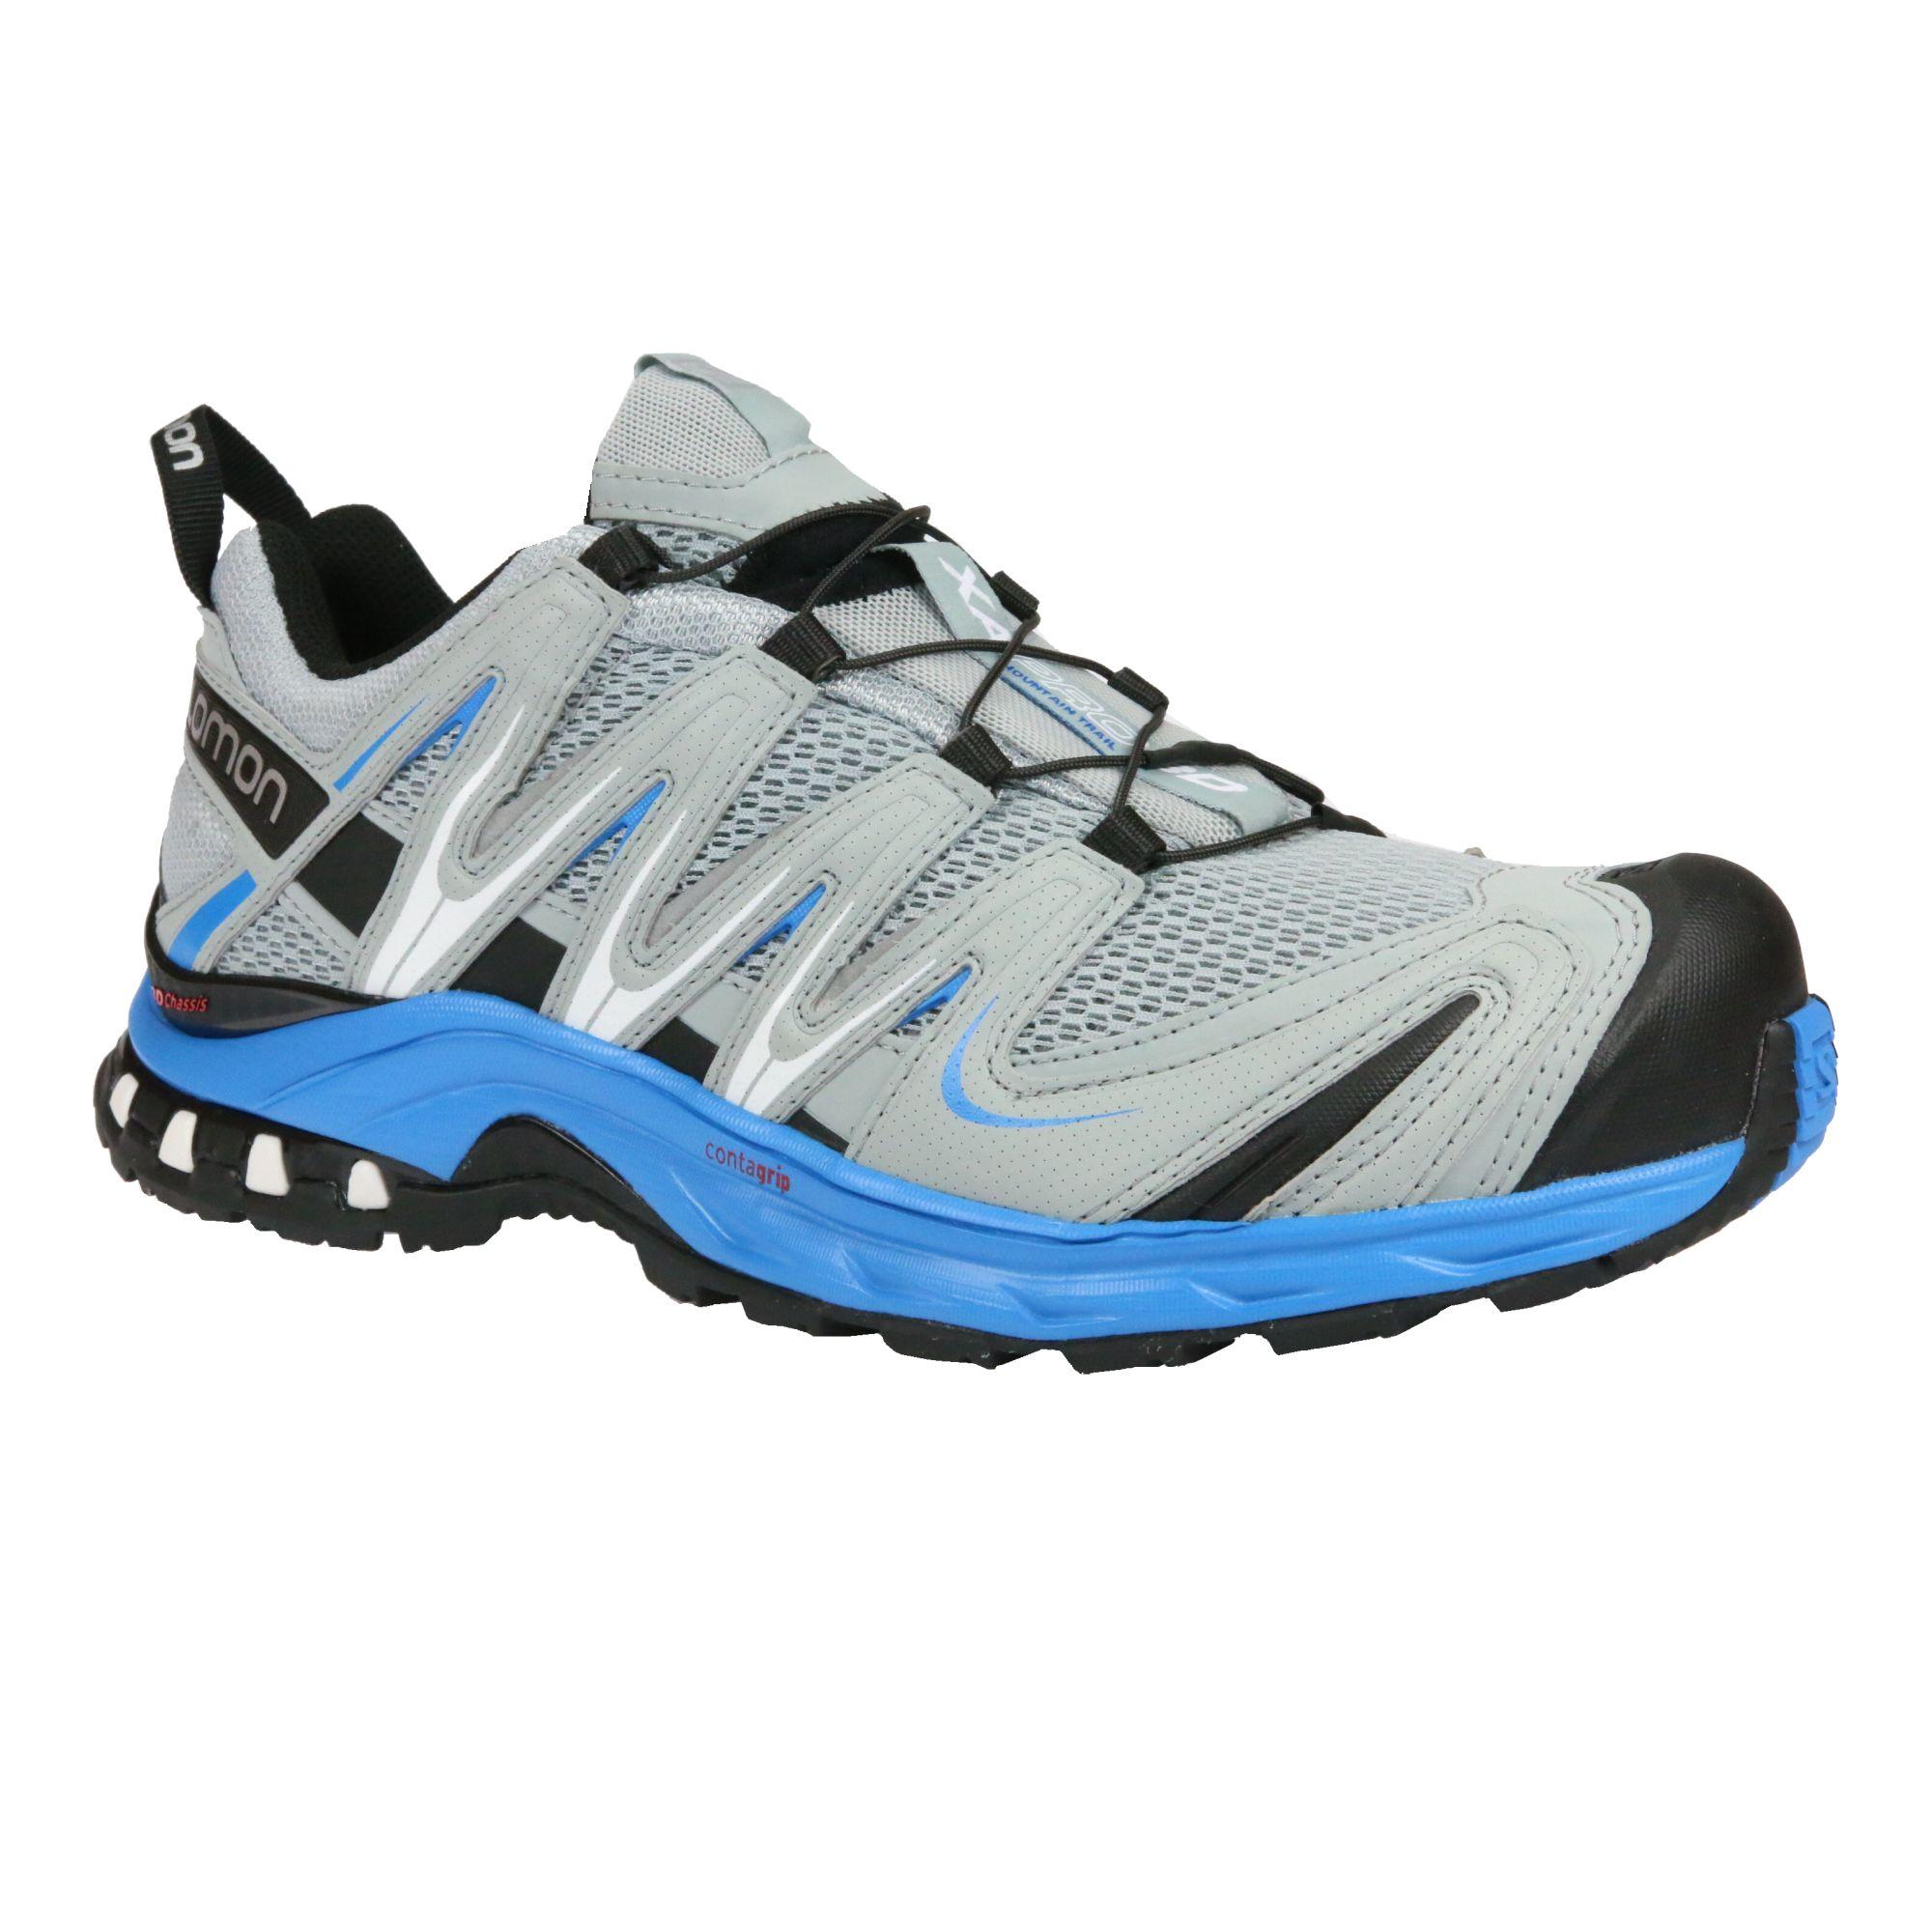 Salomon XA Pro 3D Ultra 2 Menu0026#39;s Running Shoe / Trail ...